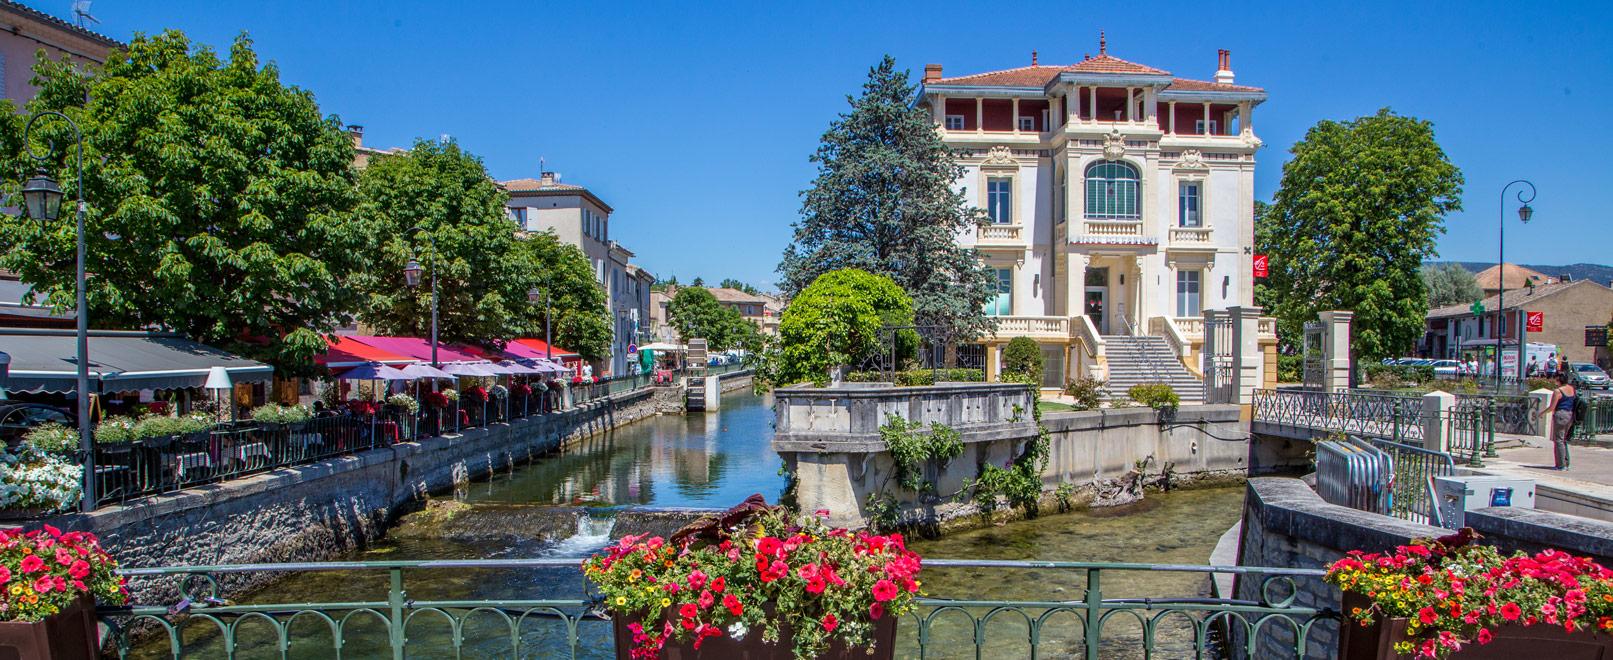 L'Isle-sur-la-Sorgue, a timeless town